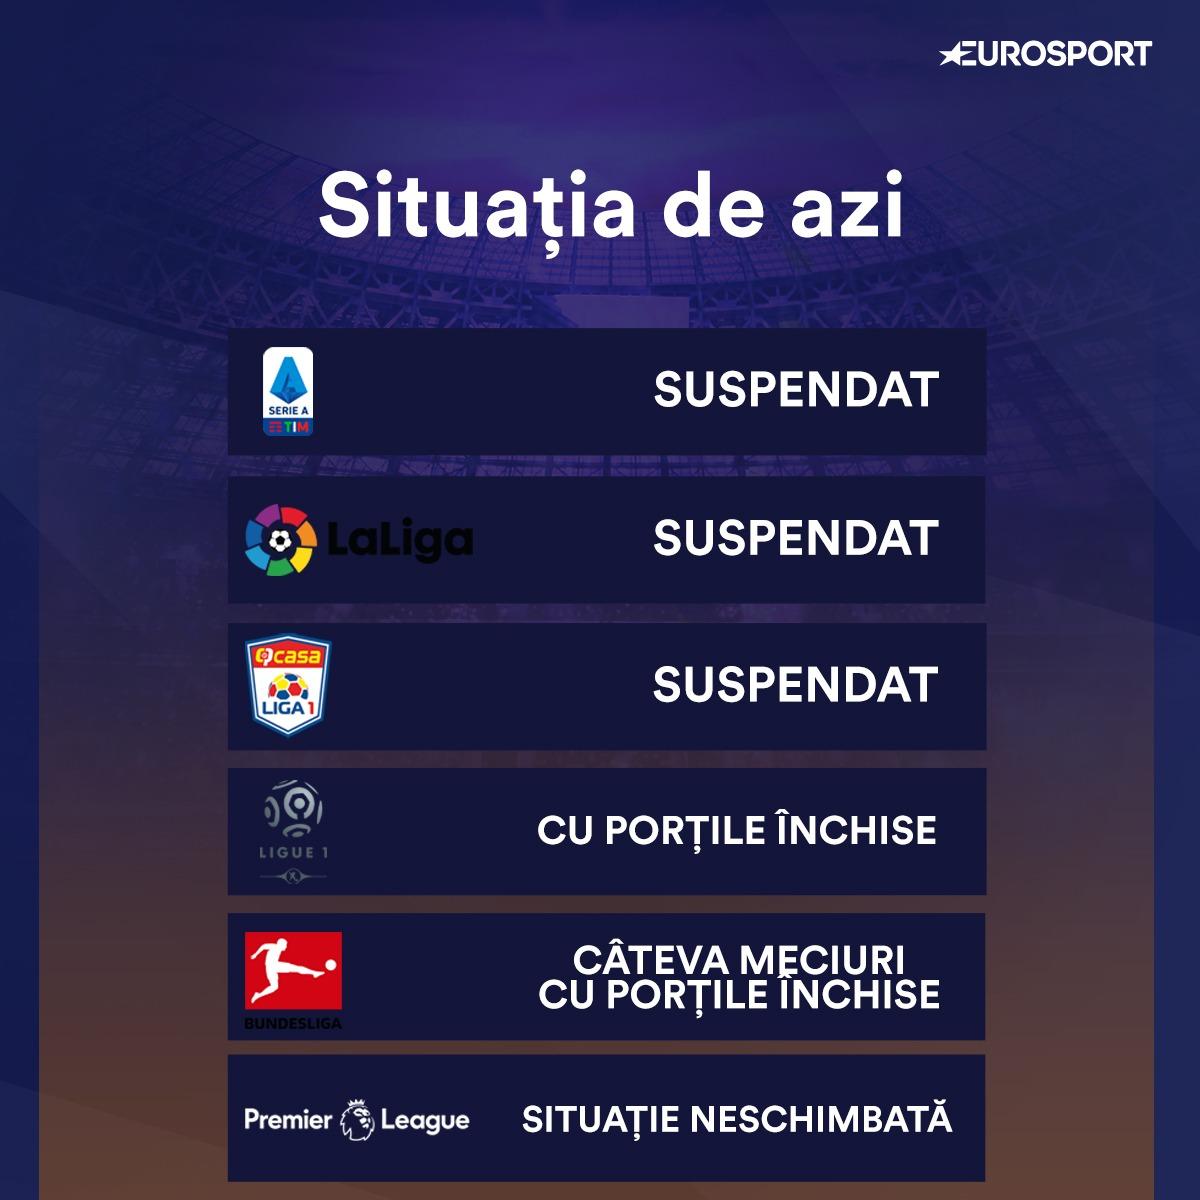 https://i.eurosport.com/2020/03/12/2793630.png